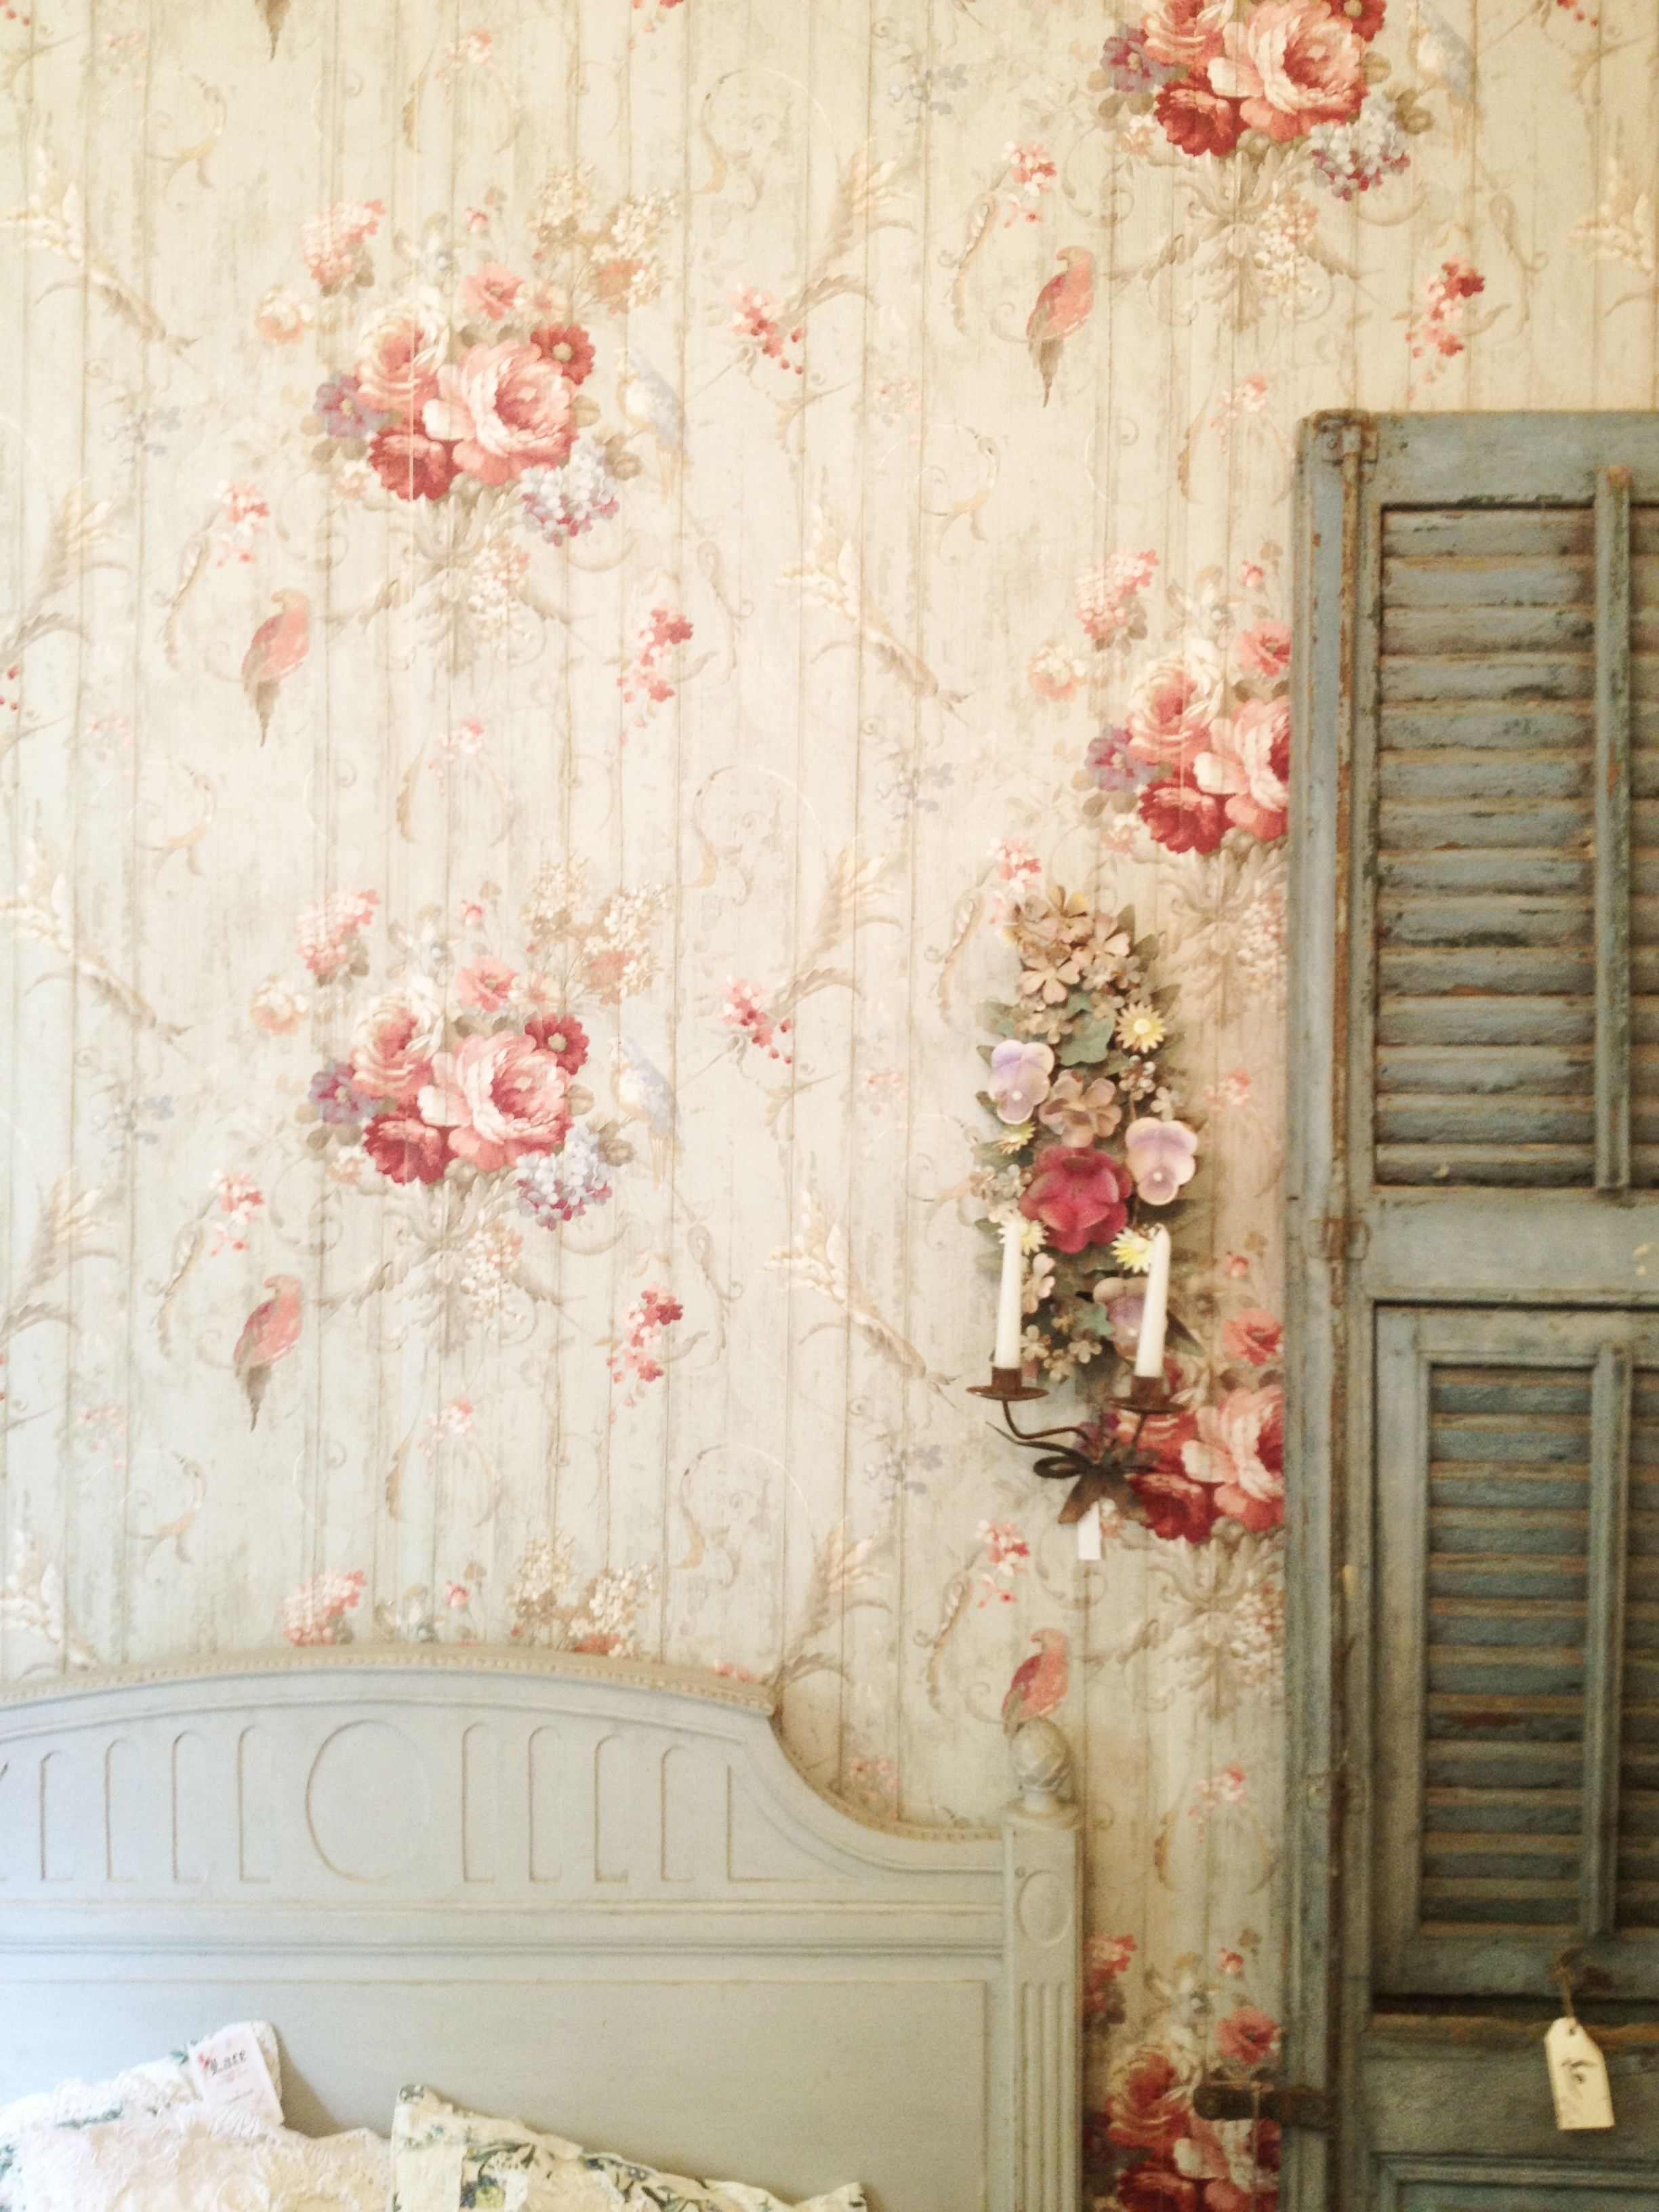 Pin by astrid den boer on shutters pinterest for Old french wallpaper